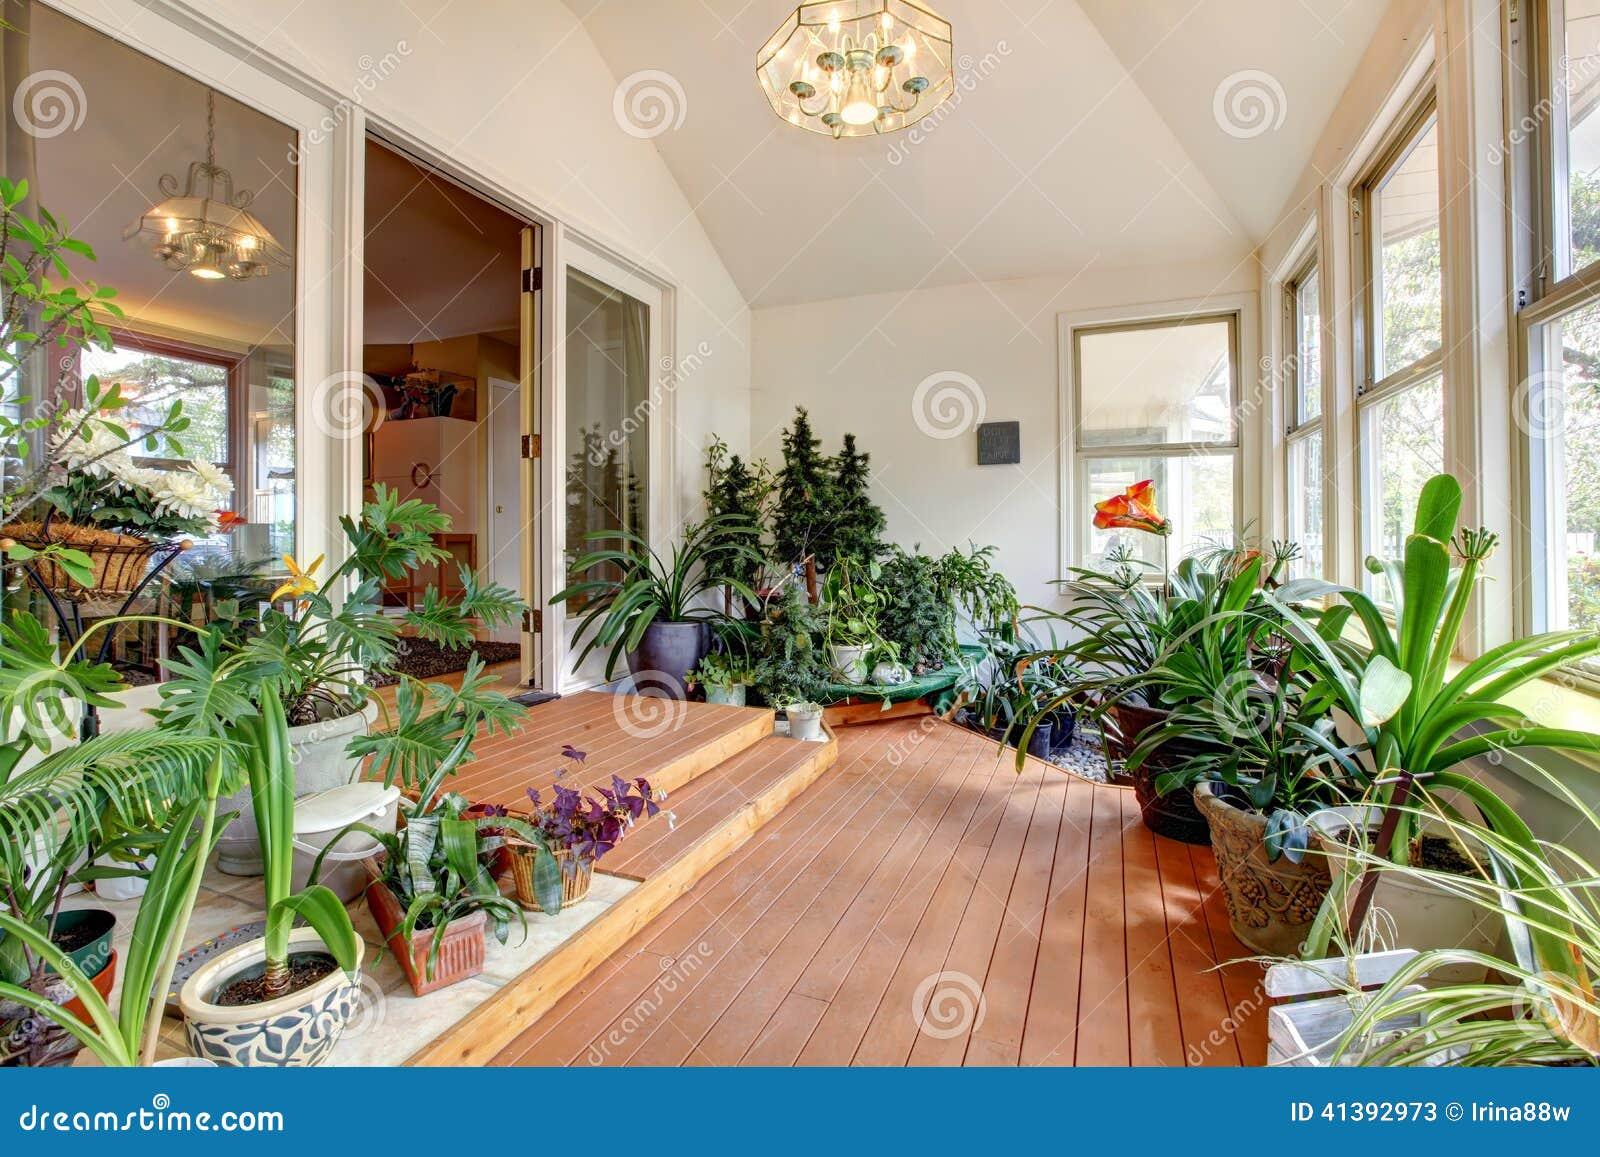 Home Greenhouse Interior Bright High Vaulted Ceiling Hardwood Floor Room Full Plants Blooming Flowers